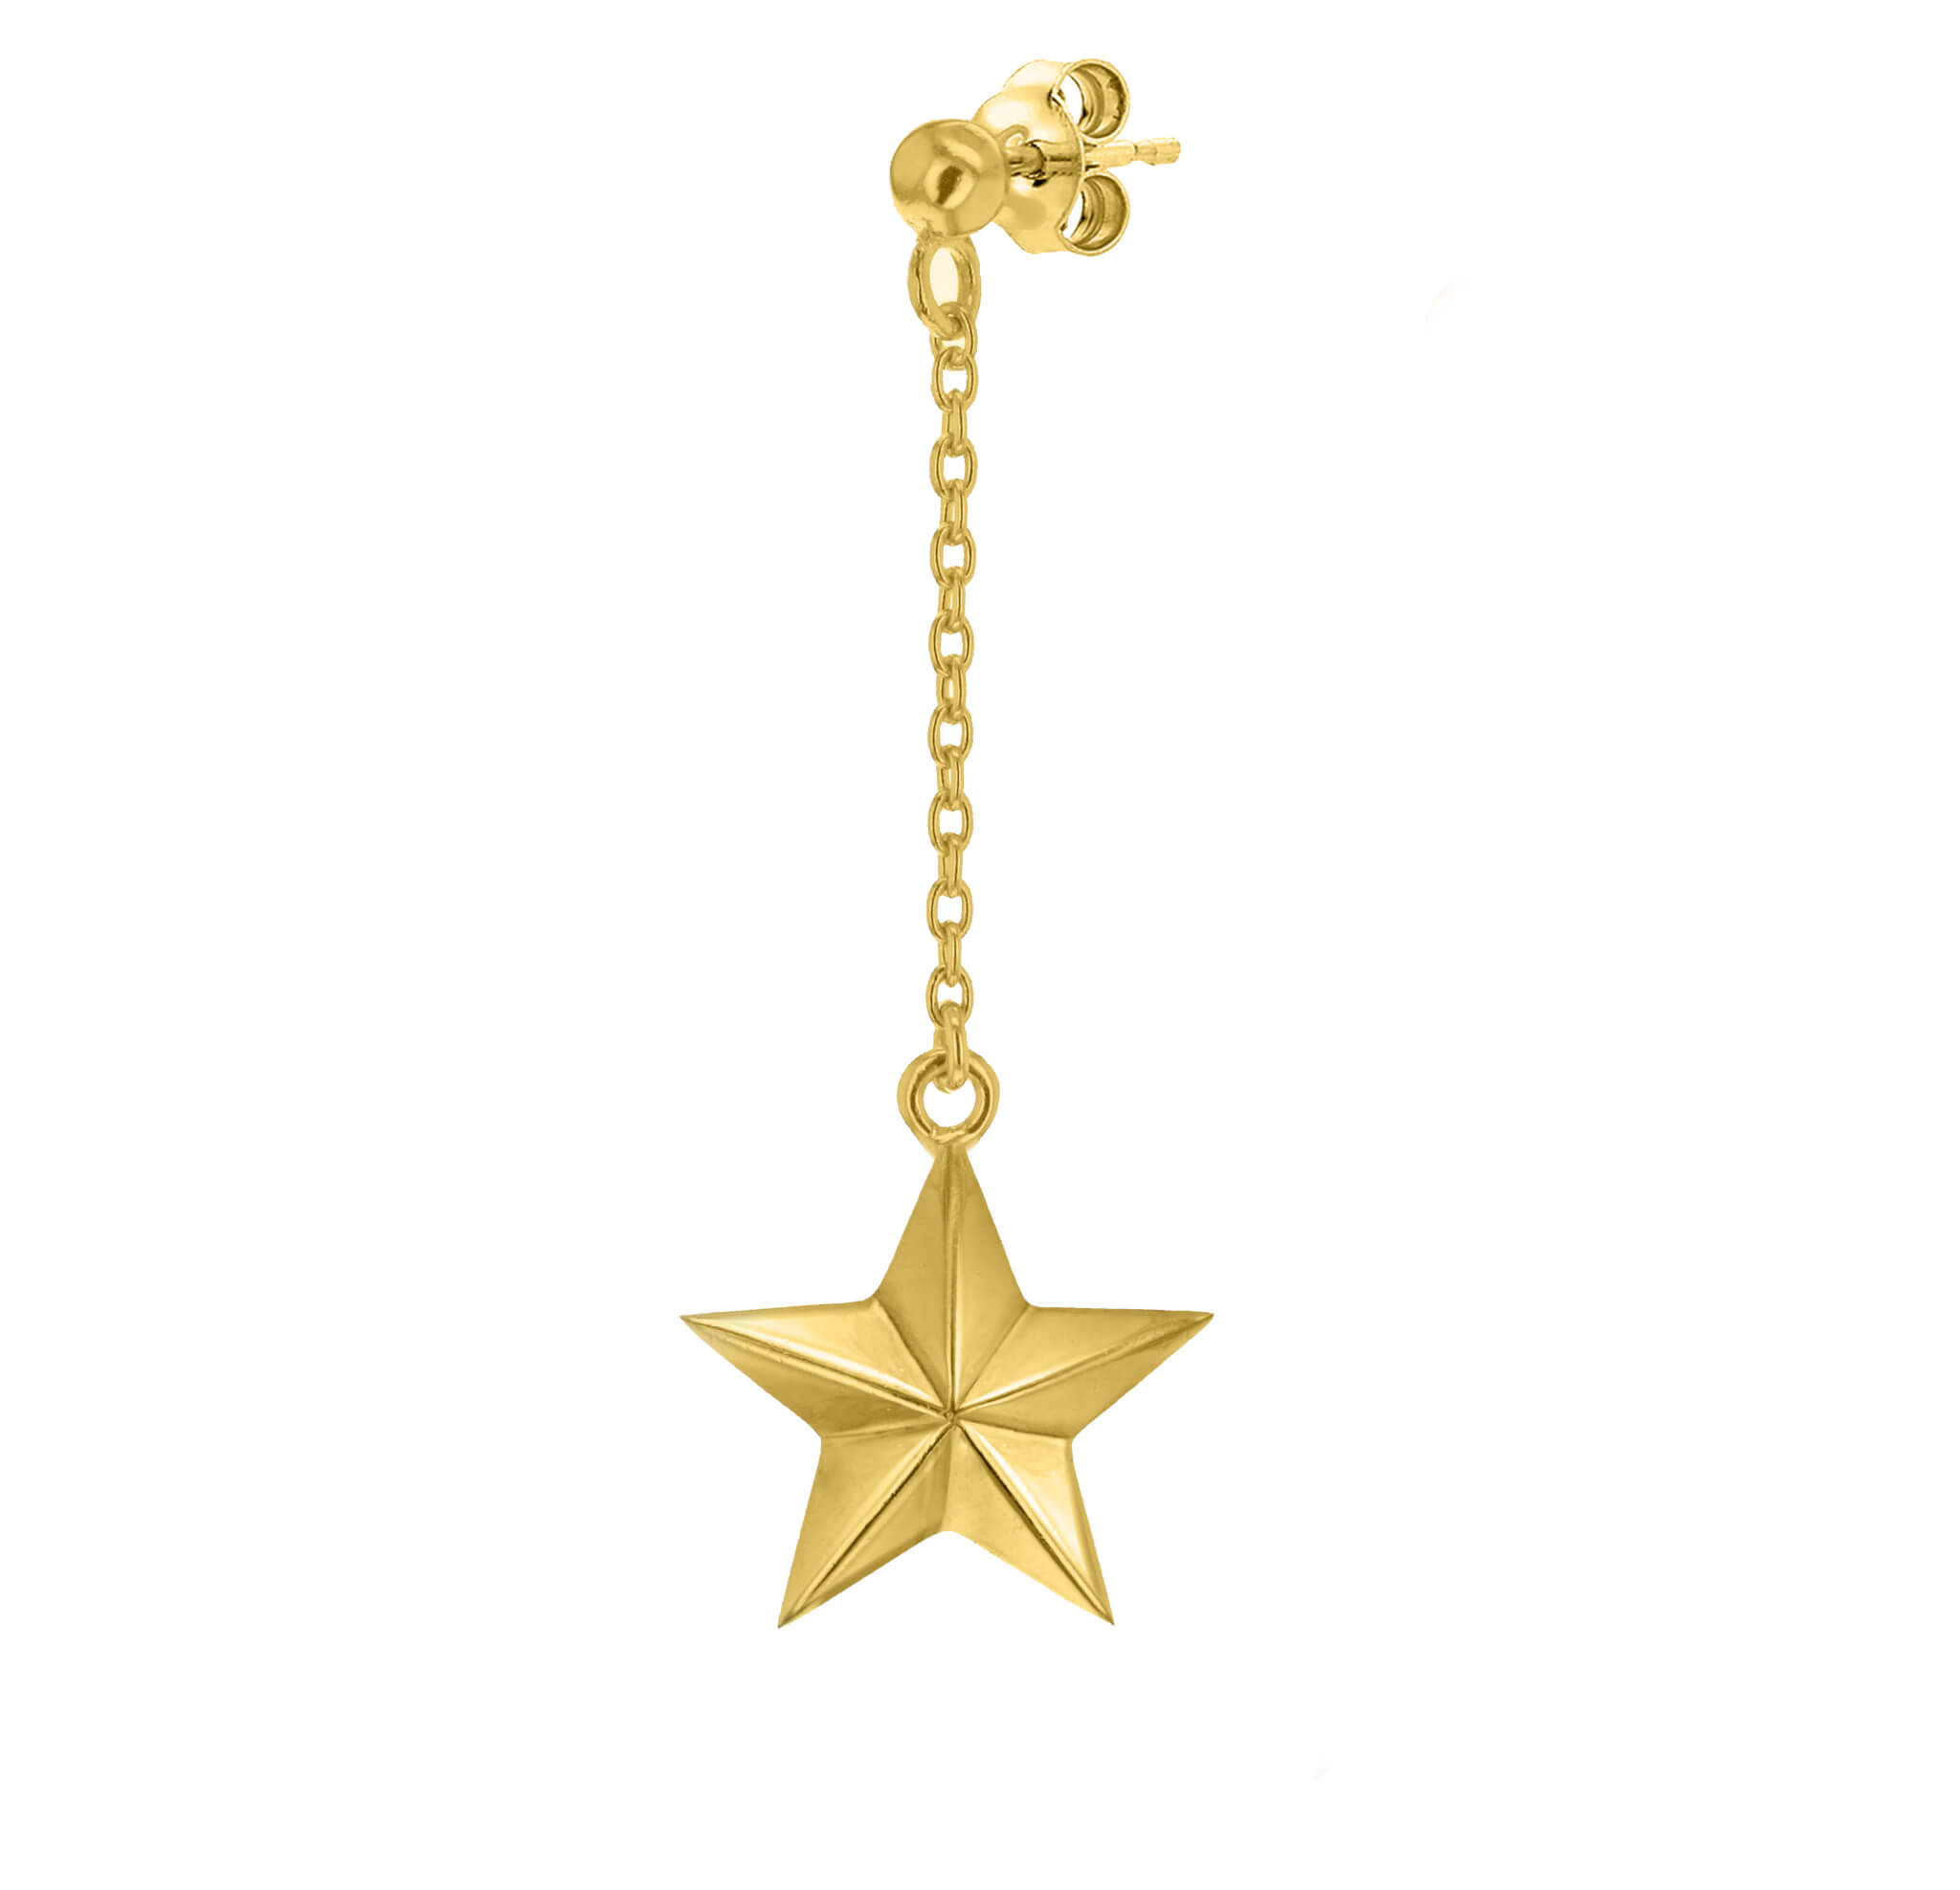 star earrings yellow.jpg1